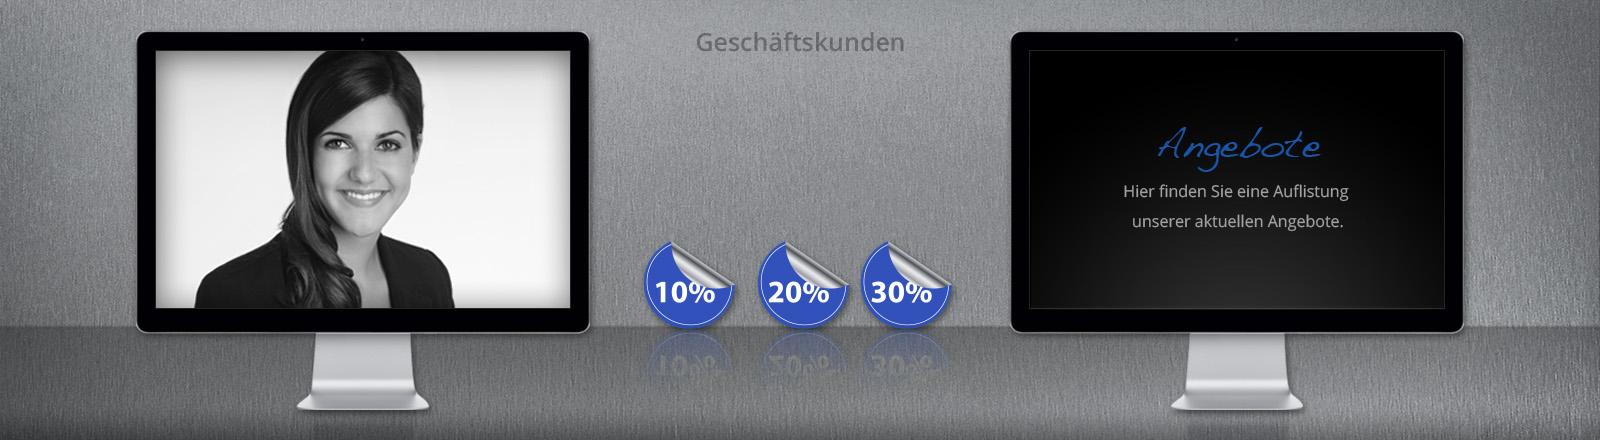 04_aktionen_business.studio-schloen.de